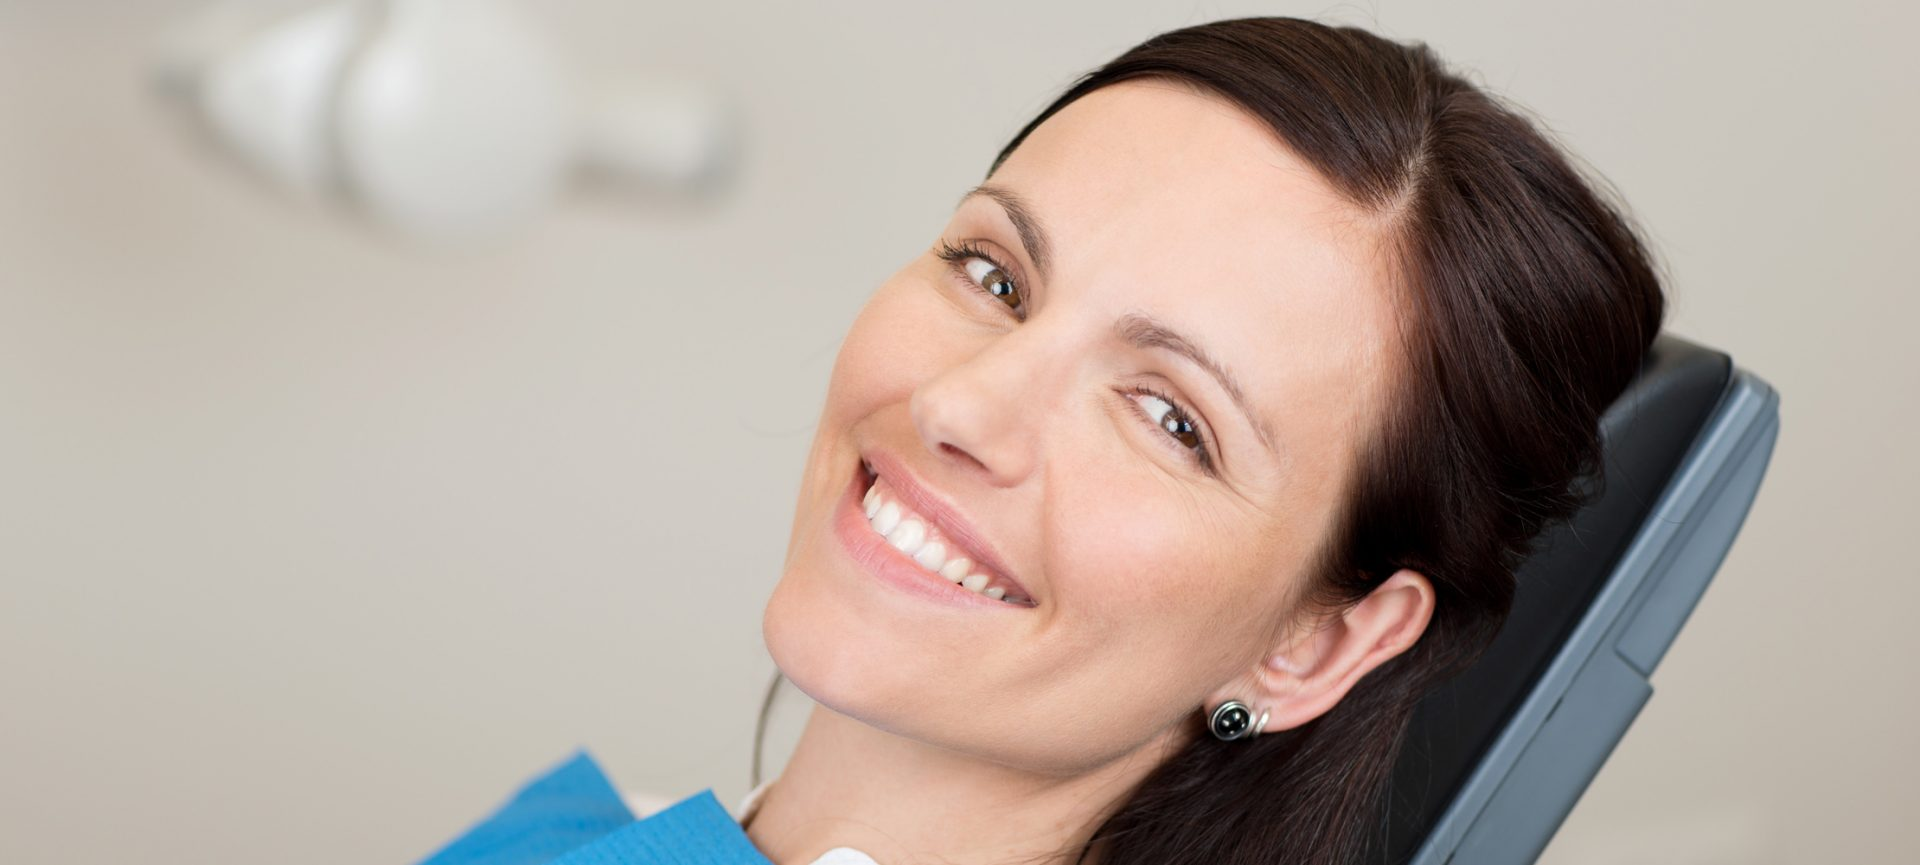 Oralchirurgie Nürtingen